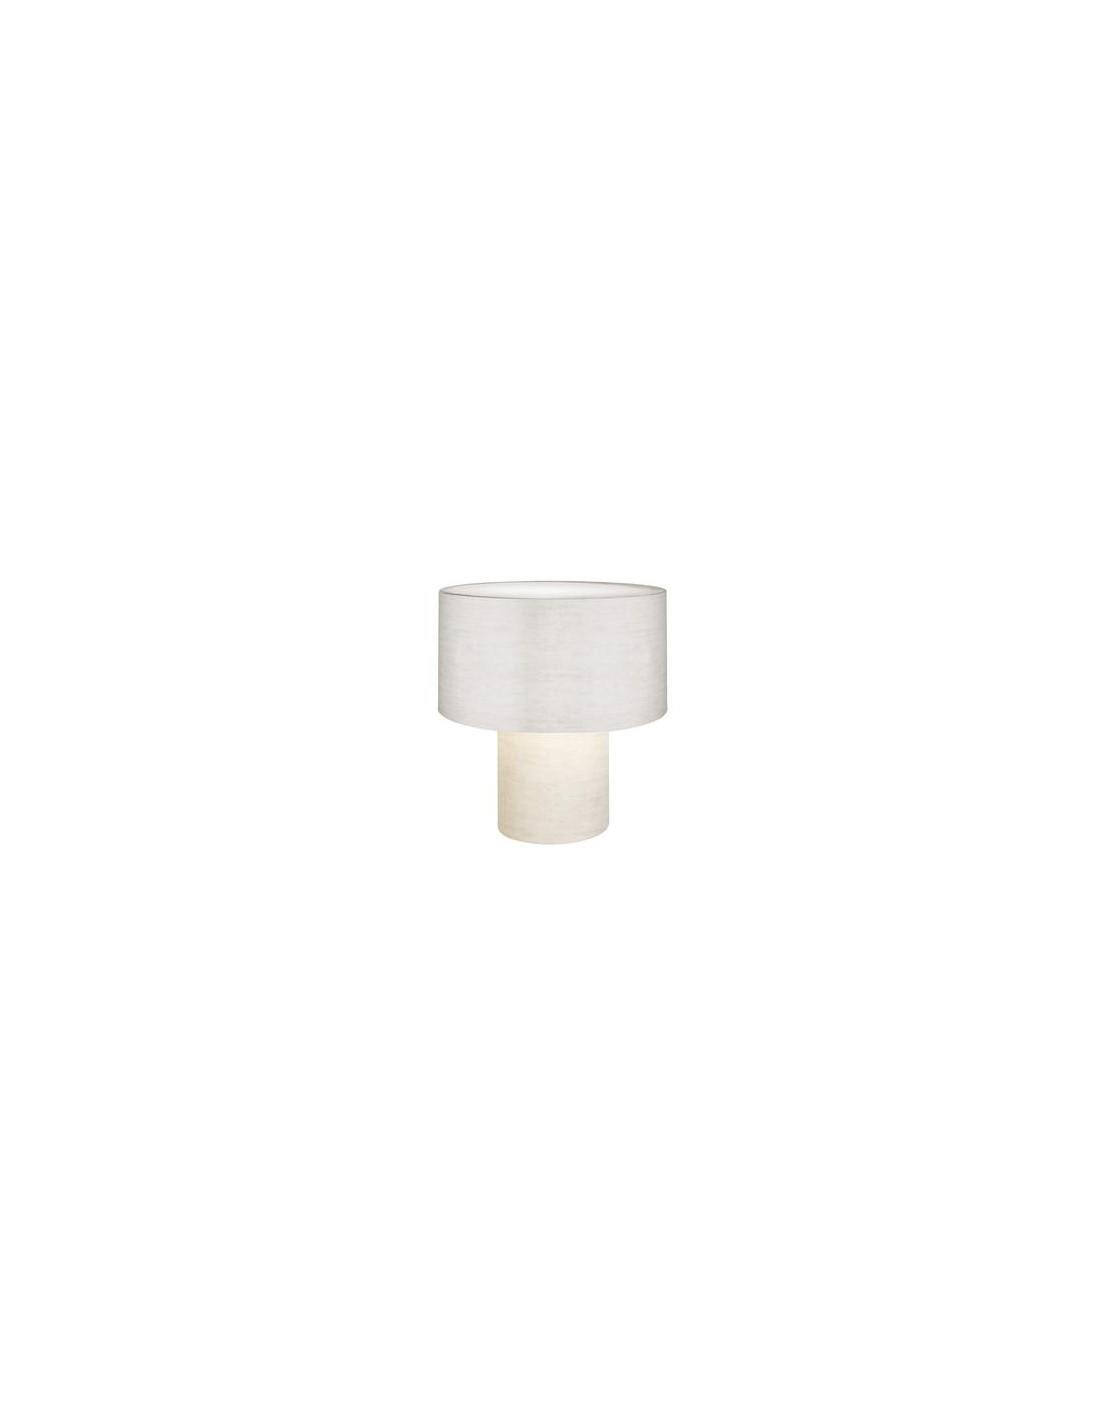 Lampe de table Pipe blanche Foscarini Diesel - Valente Design